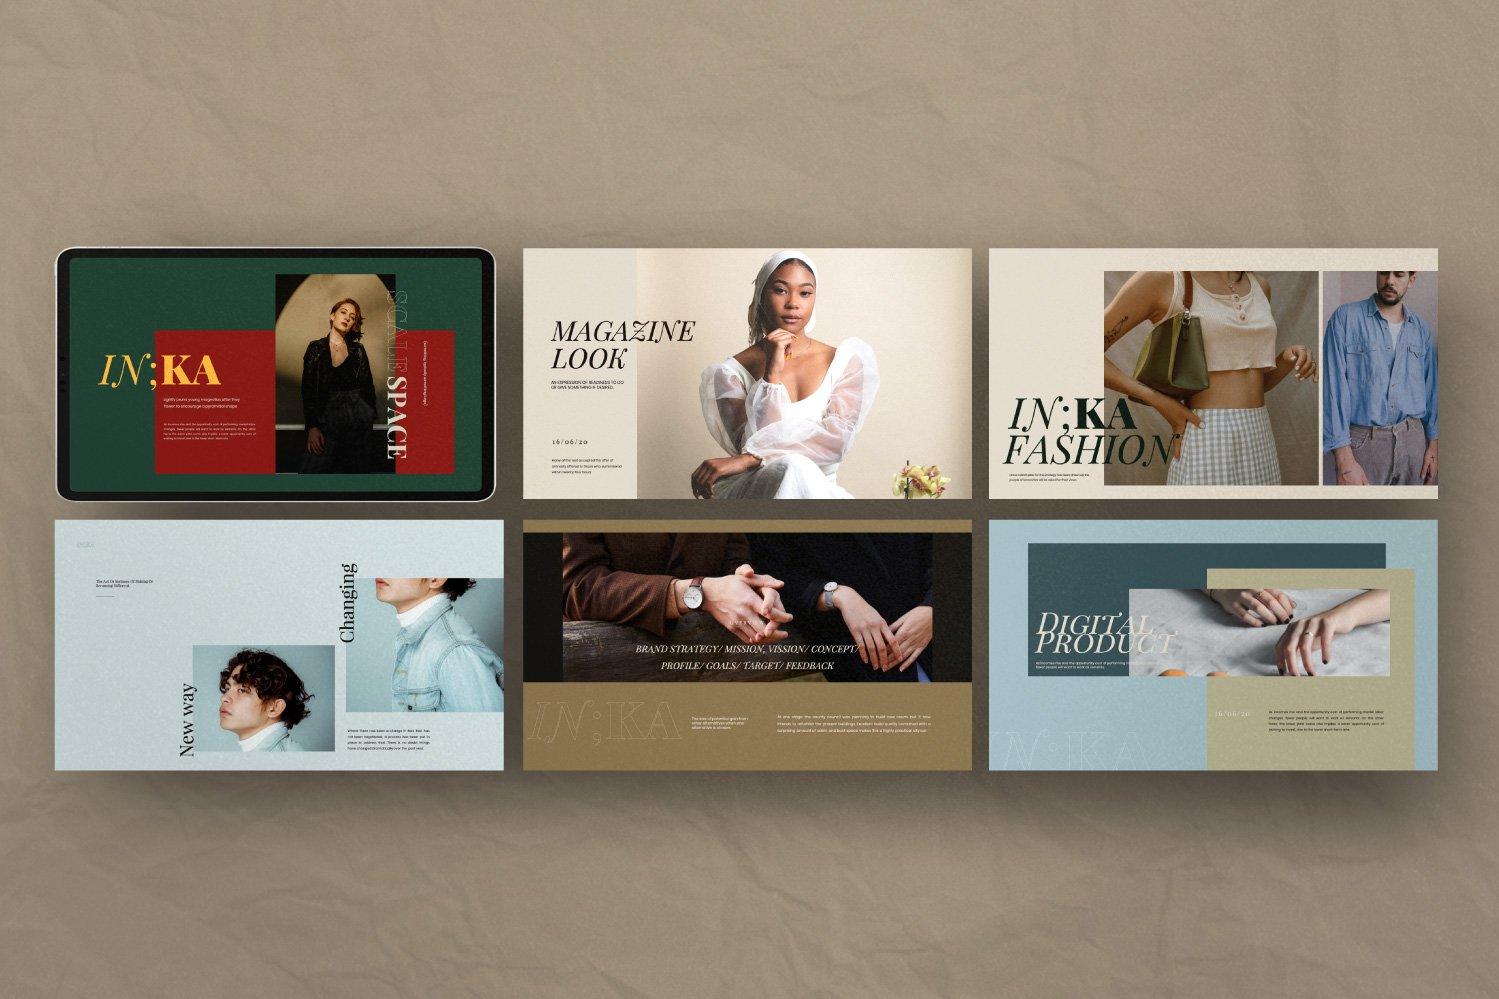 时尚创意服装摄影作品集幻灯片设计模板 Iconic – Fashion Lookbook PowerPoint插图(4)